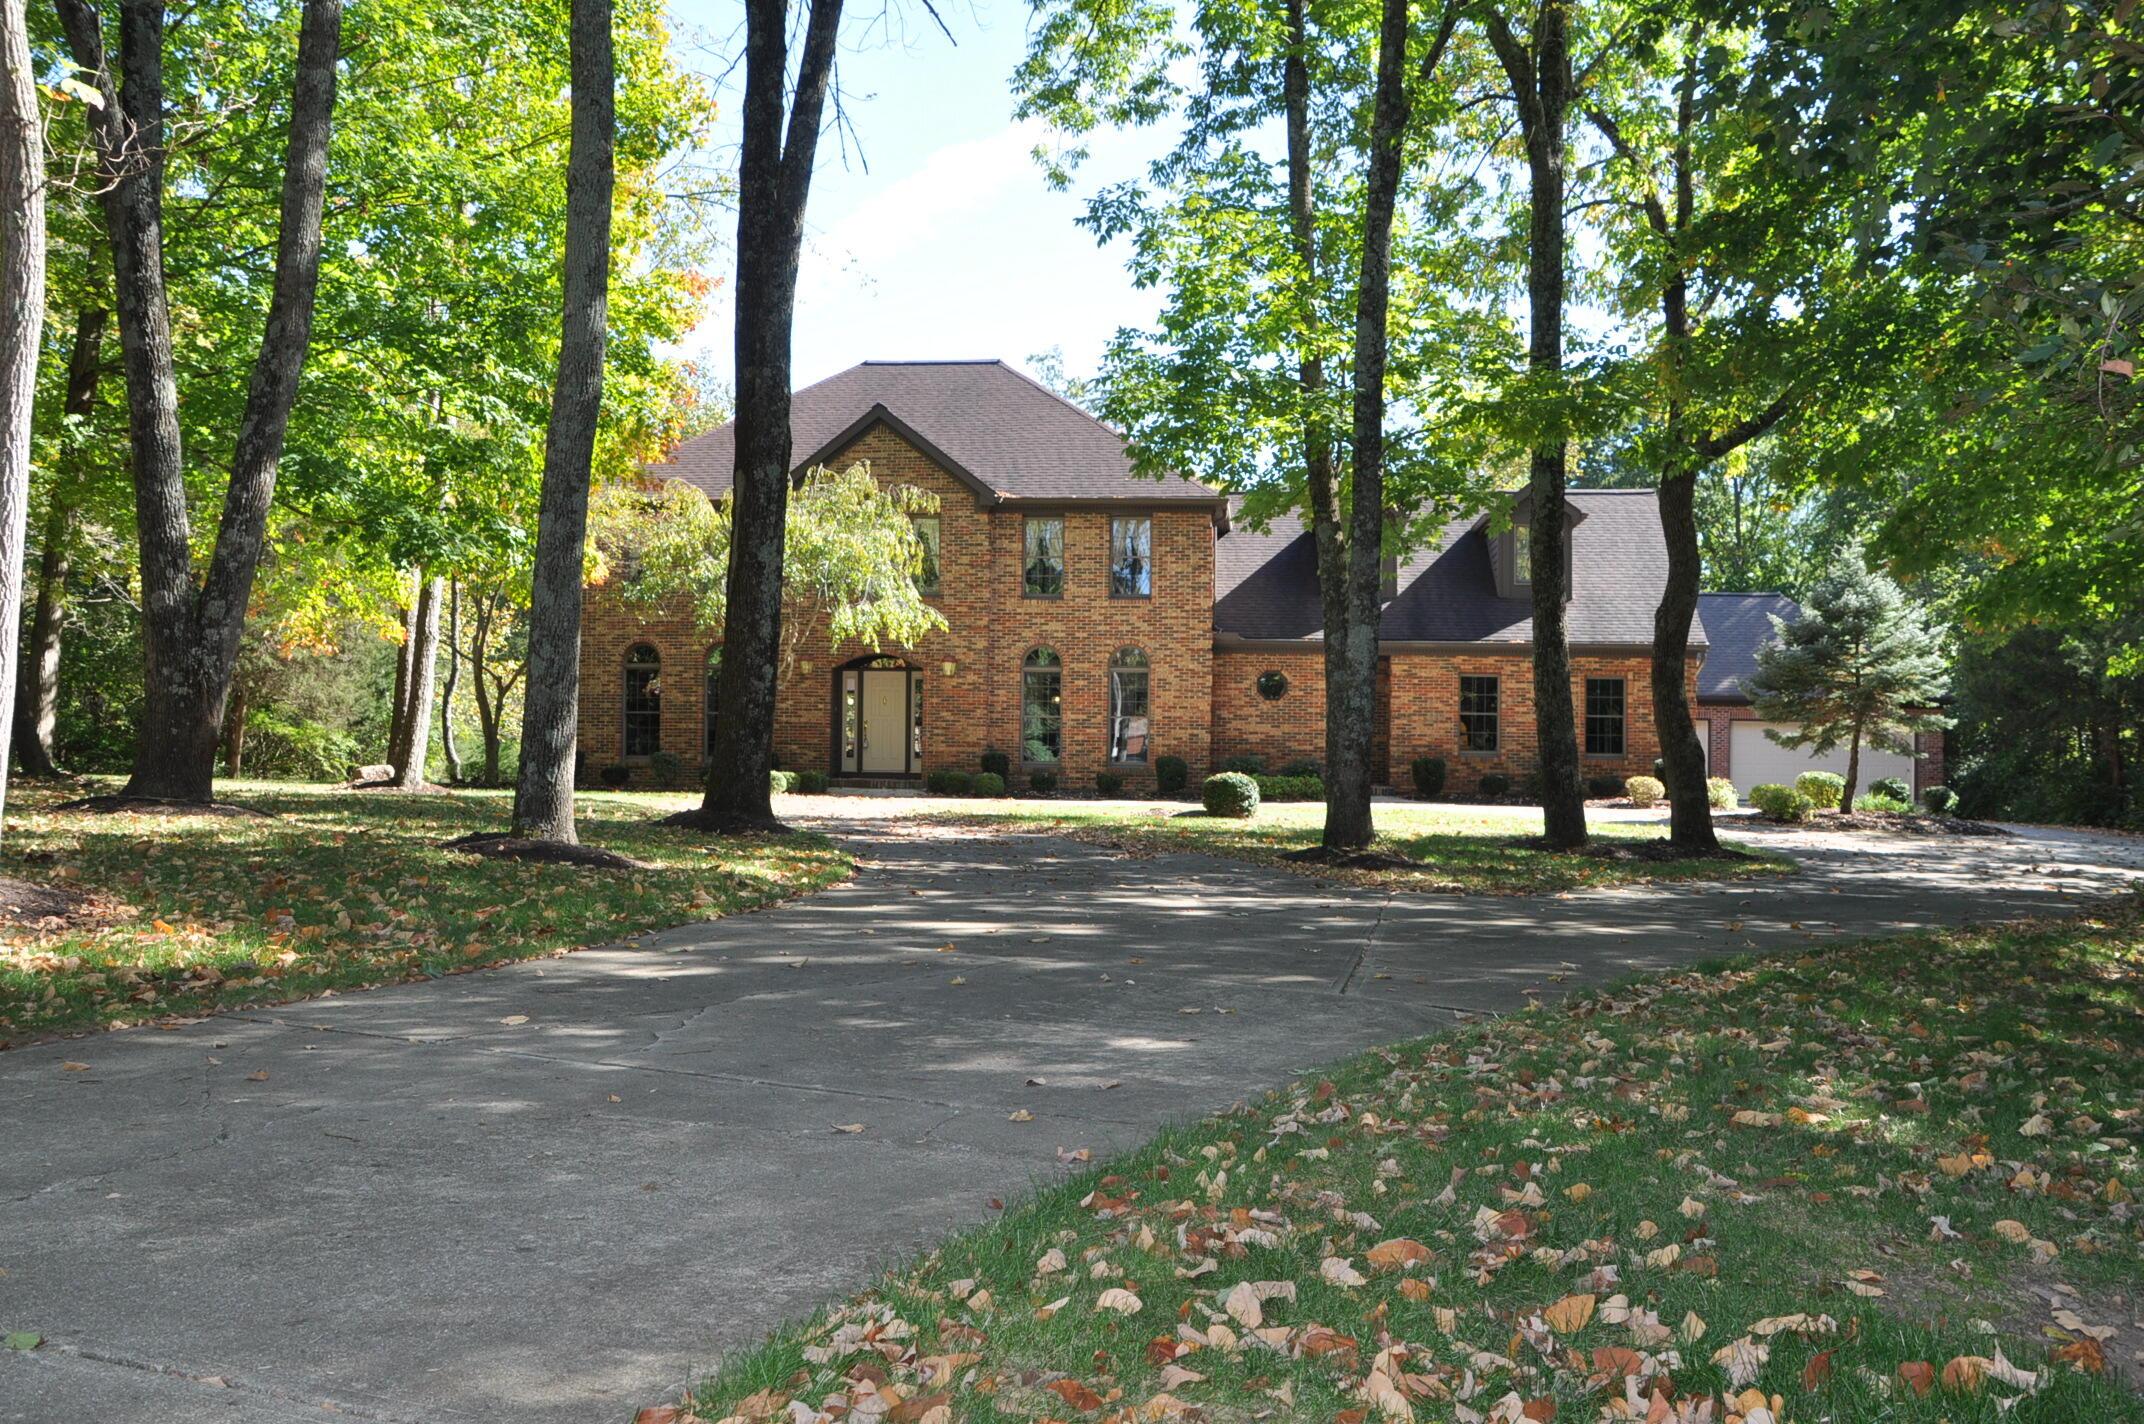 7695 Whispering Oaks Trail Property Photo 1